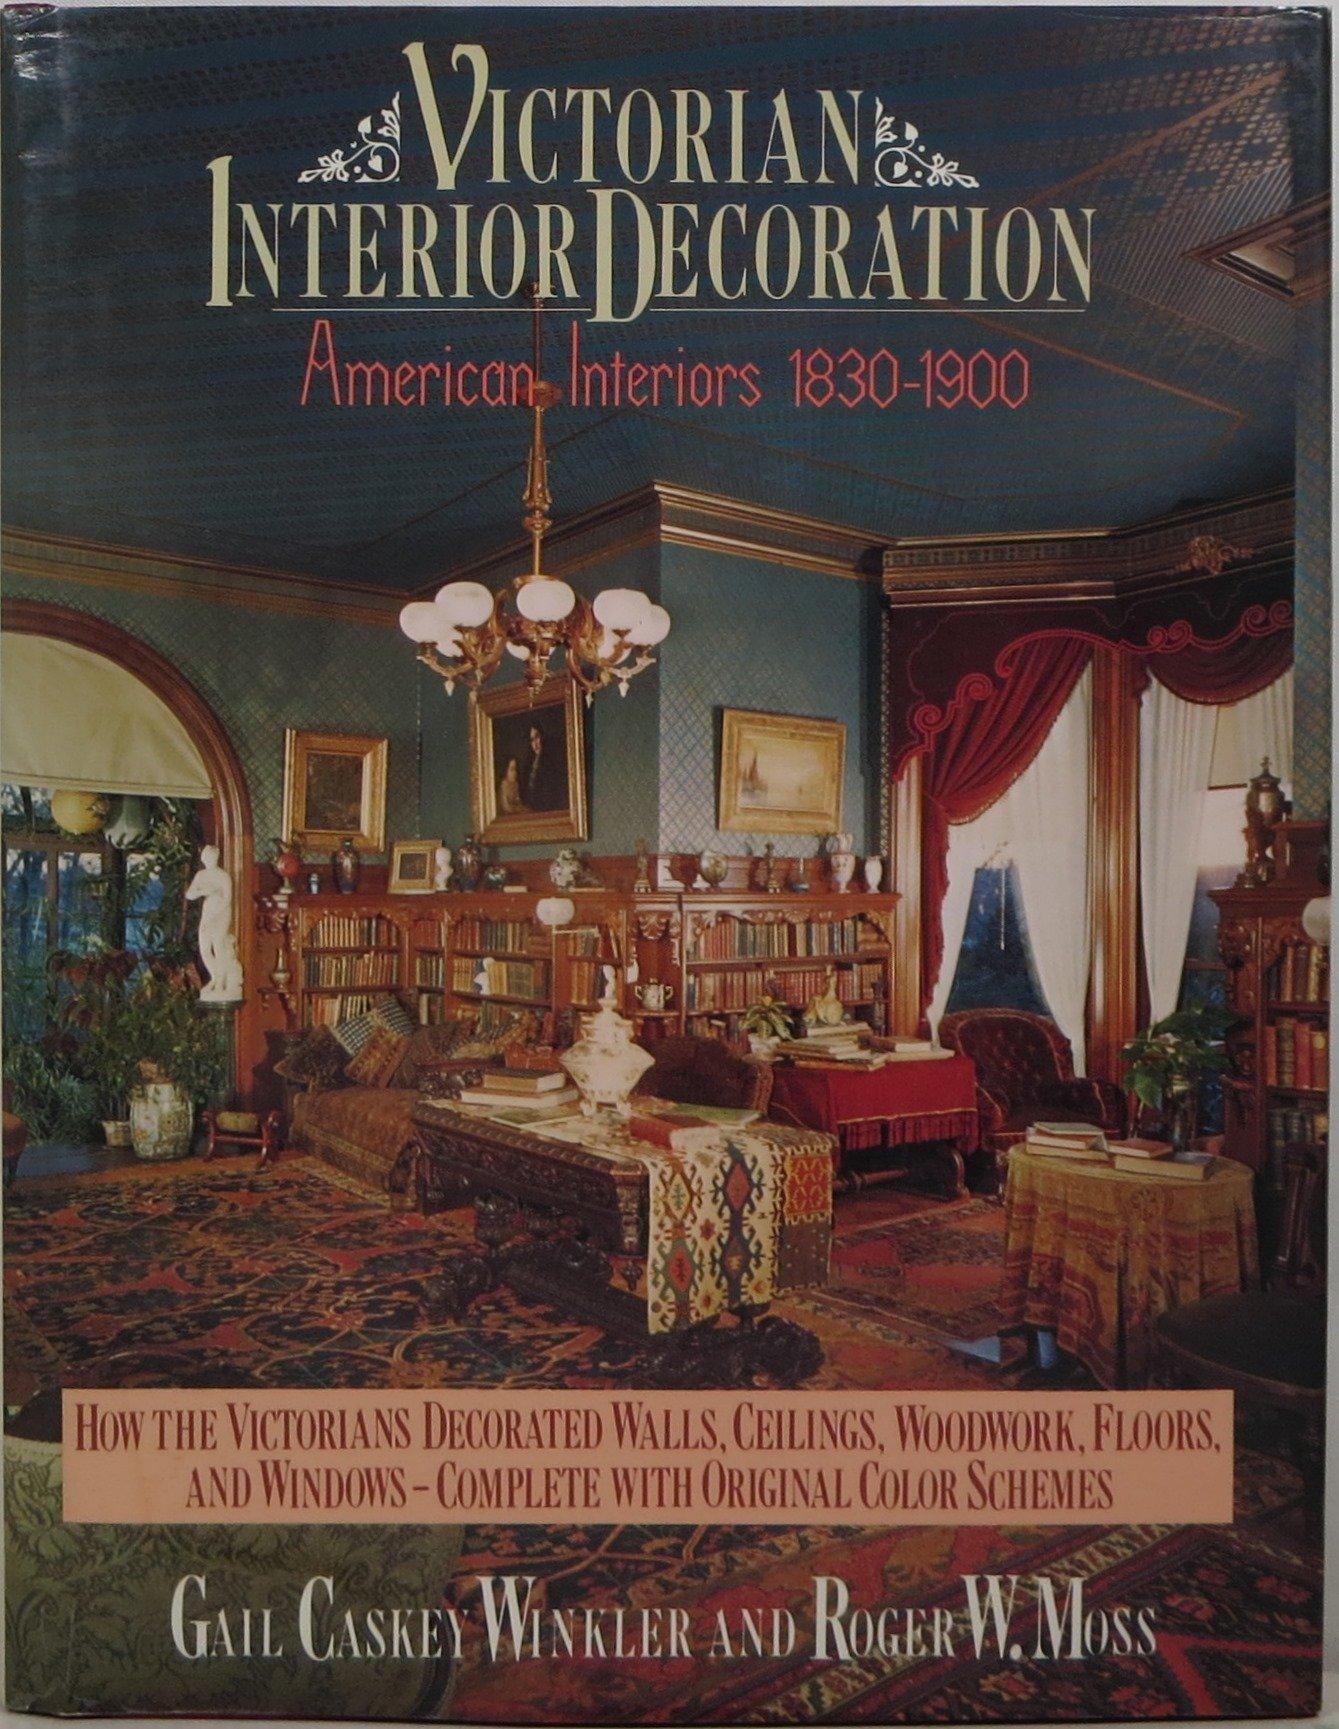 Victorian Interior Decoration: American Interiors, 1830-1900